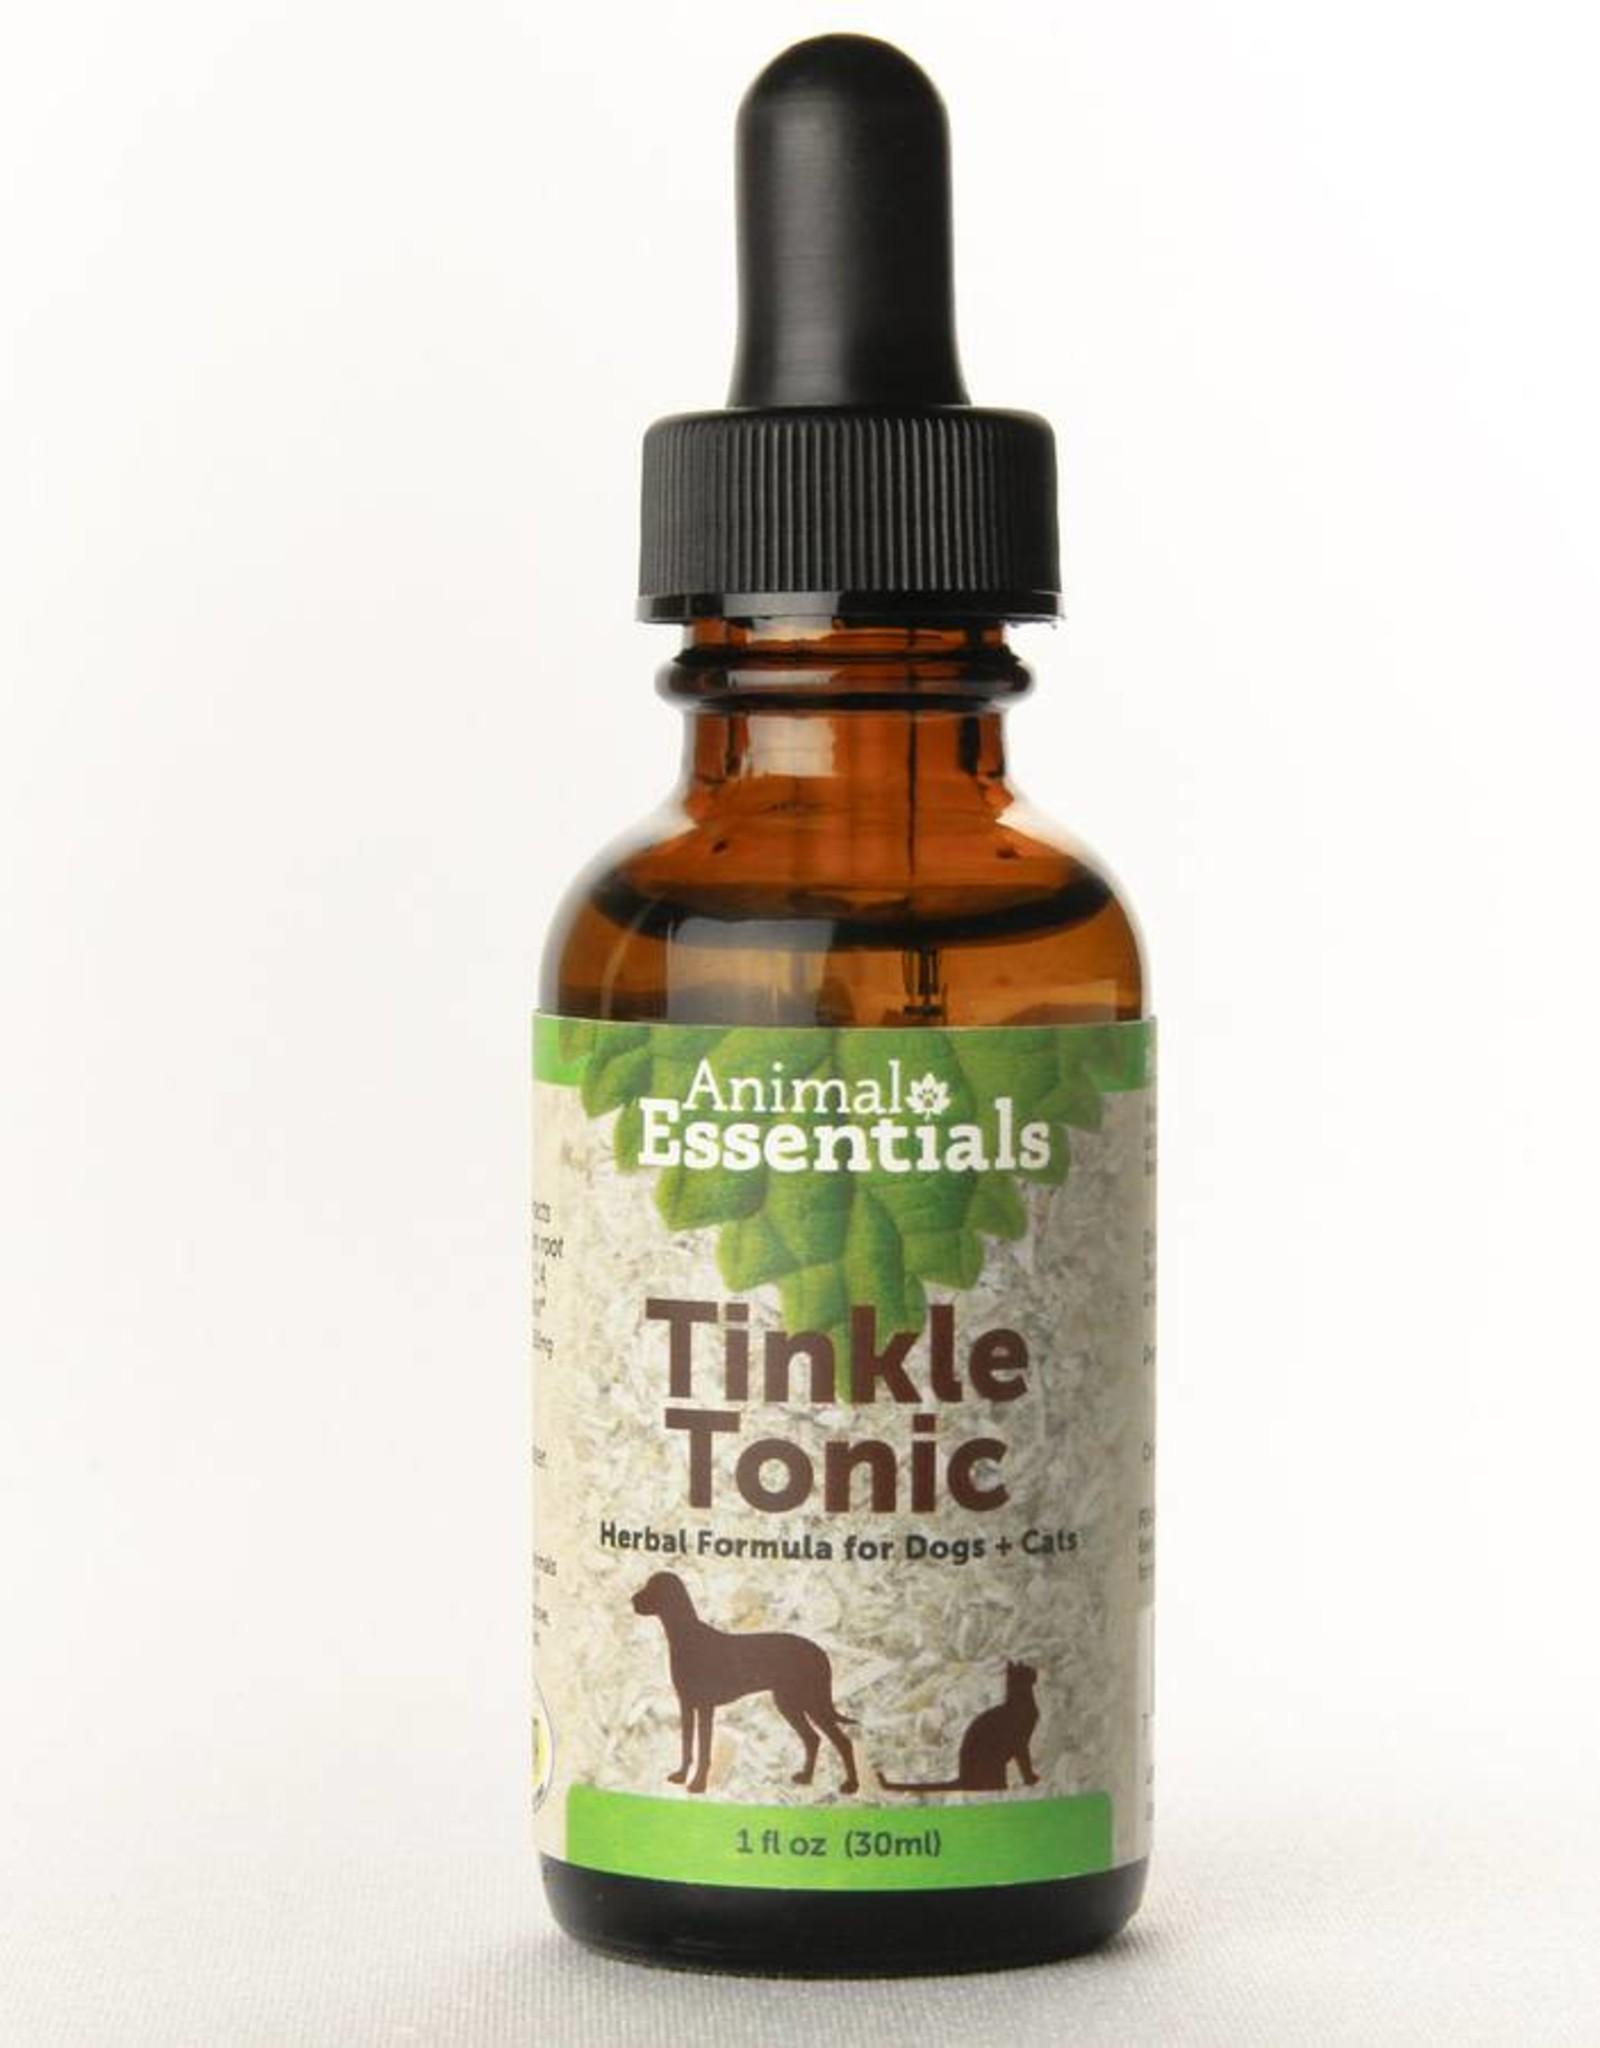 Animal Essentials Animal Essentials Tinkle Tonic 1oz